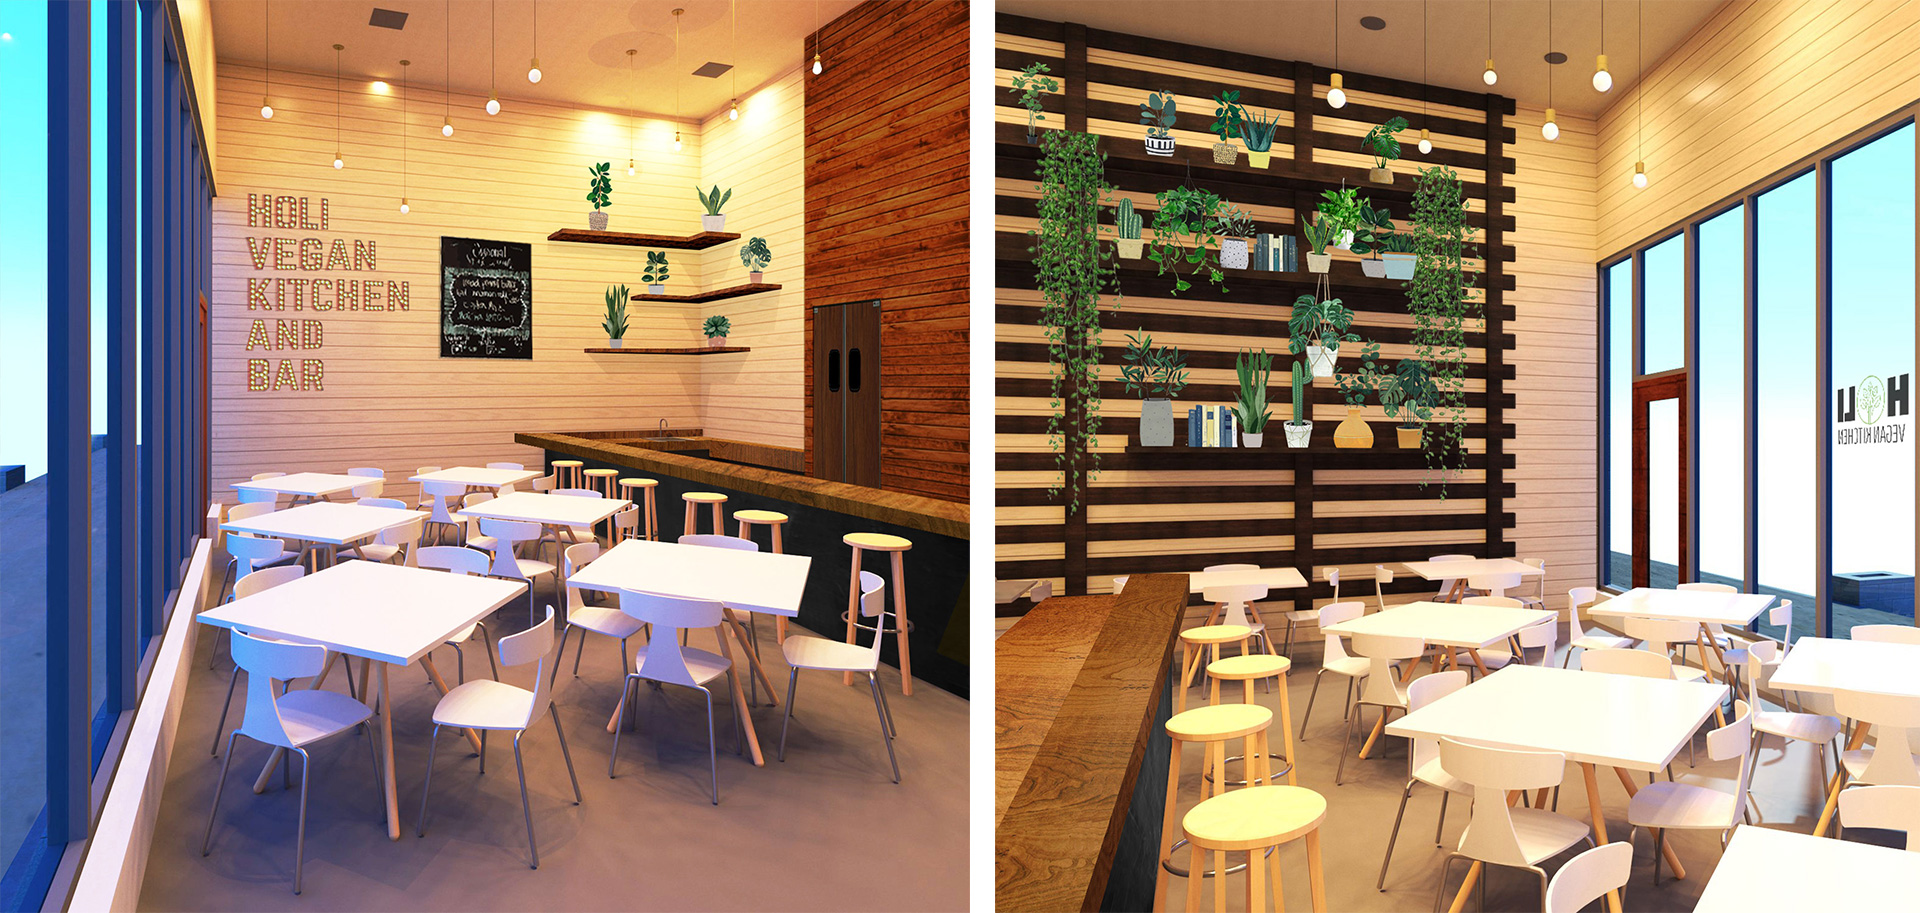 holi vegan kitchen and bar